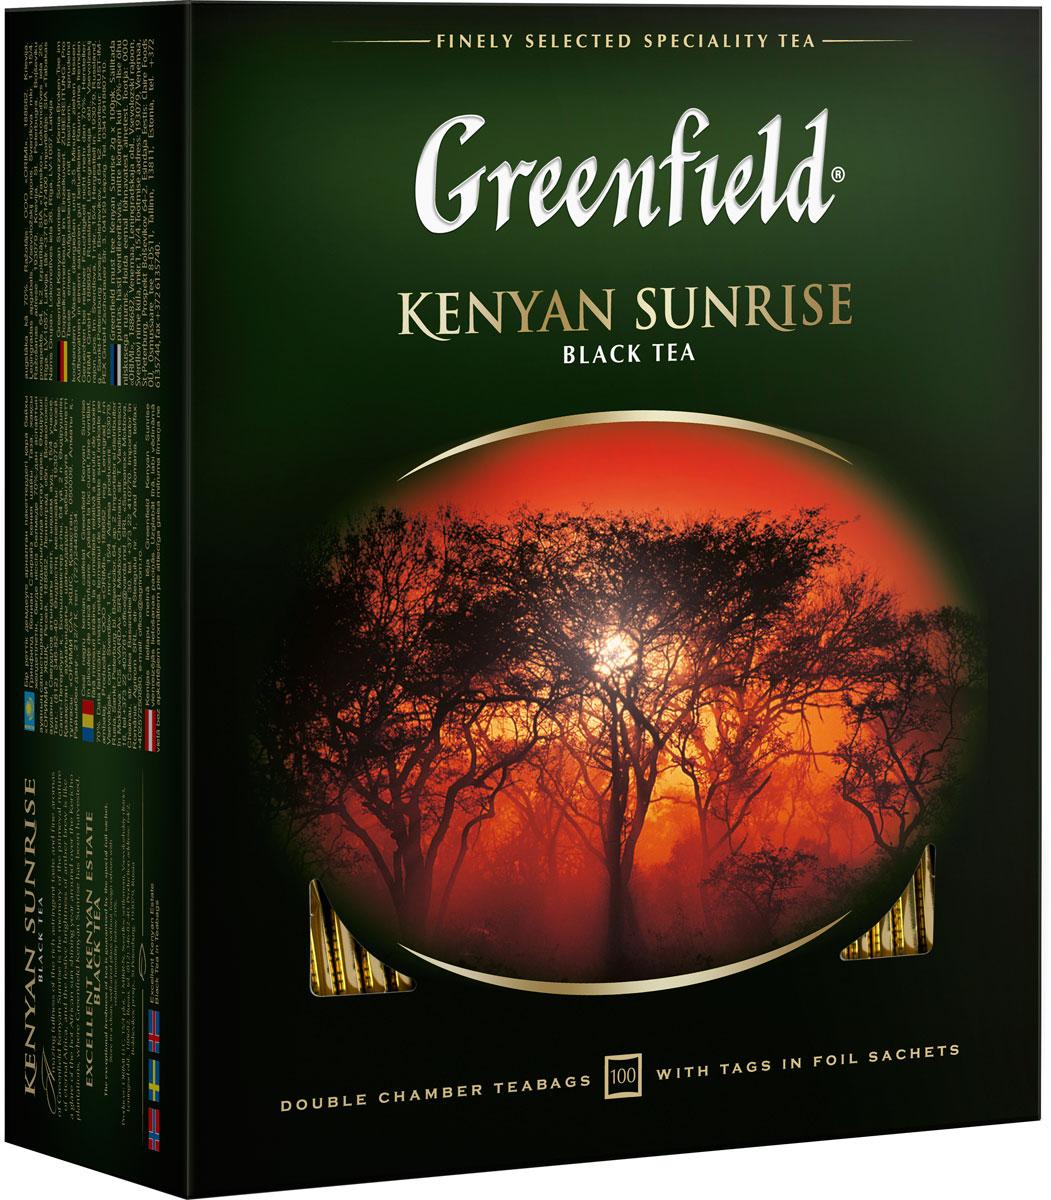 Greenfield Kenyan Sunrise черный чай в пакетиках, 100 шт